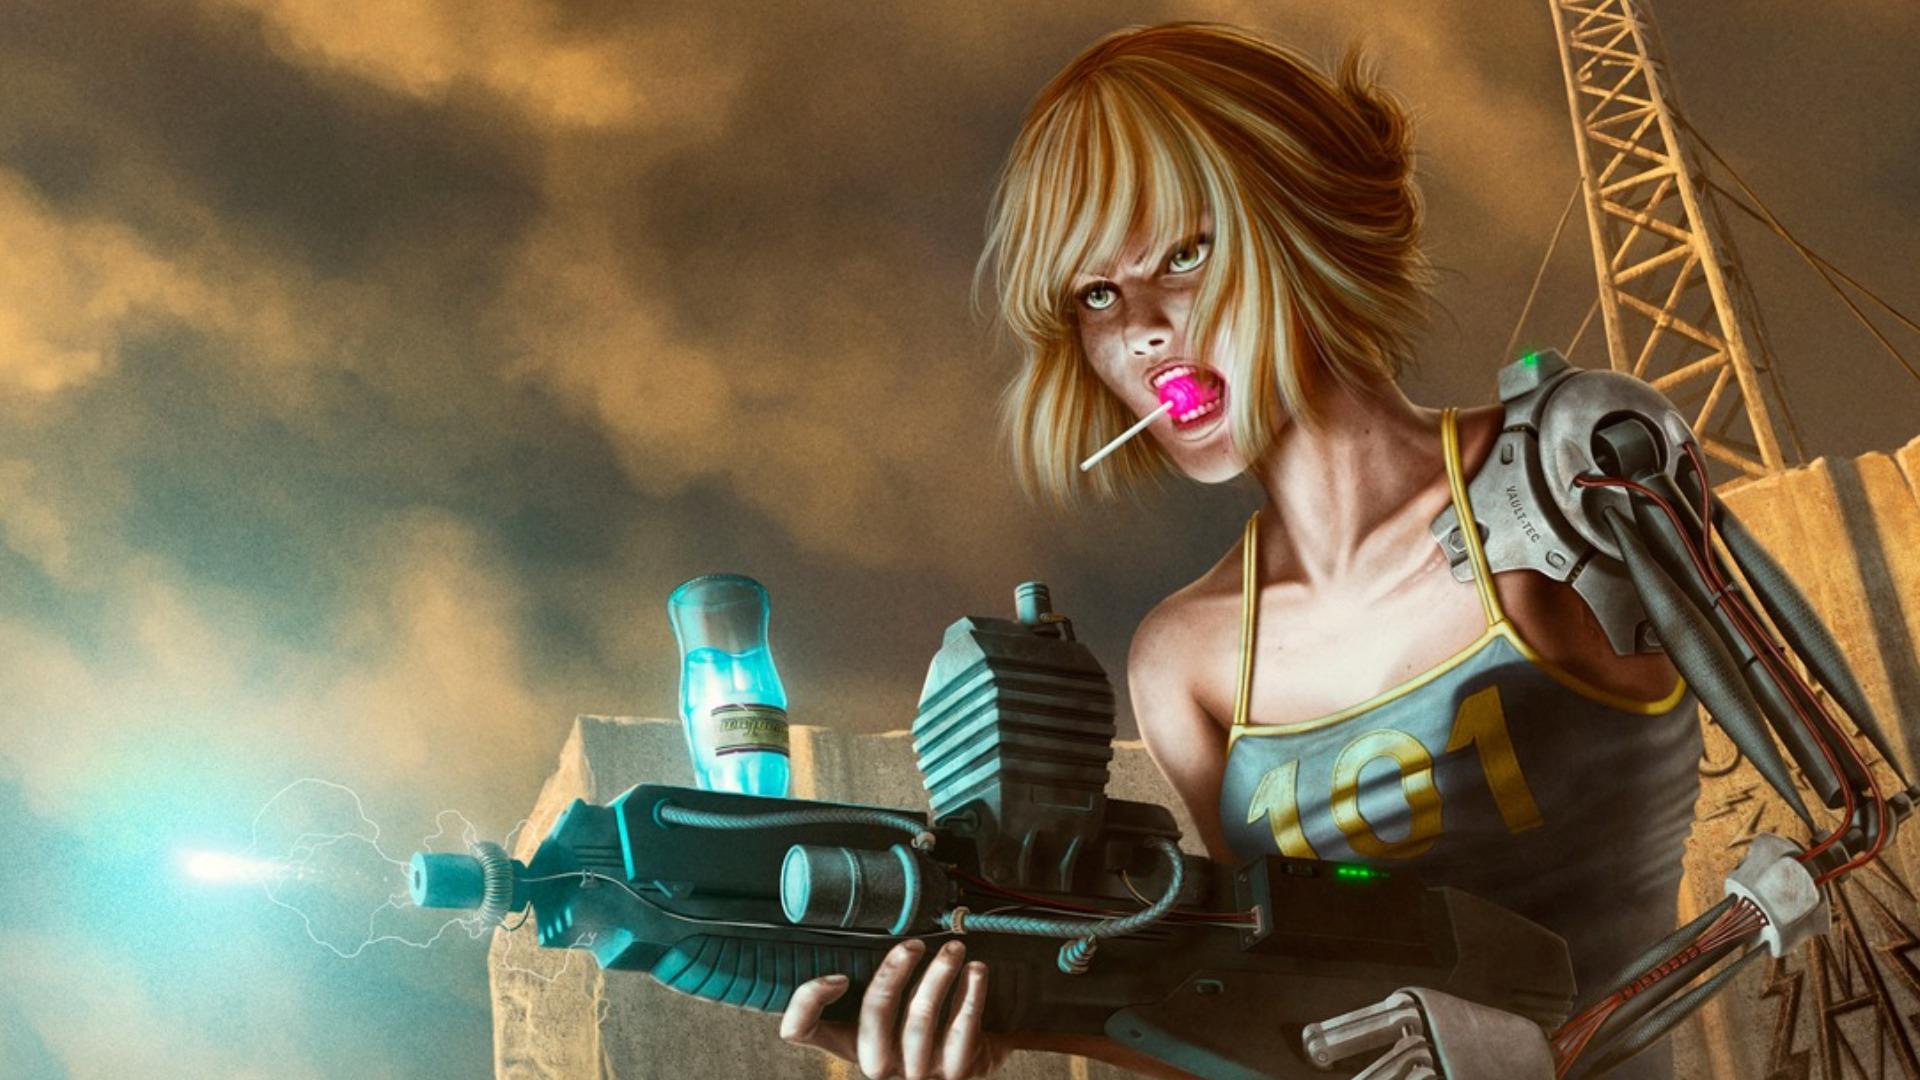 Fall Out Boy Wallpaper Ipad Jeux Vid 233 O Fallout Fond D 233 Cran